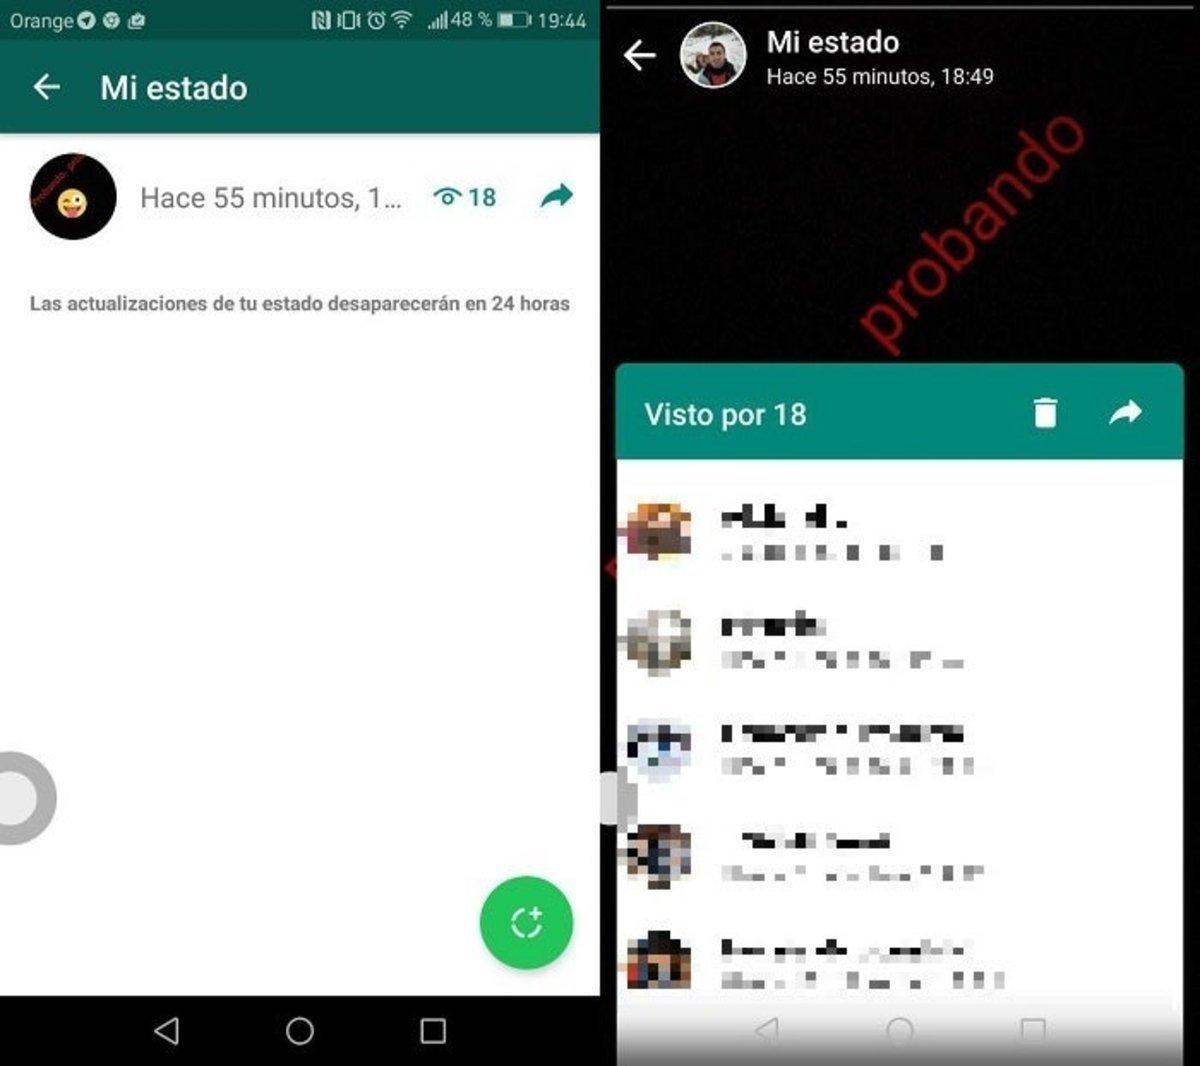 Estados whatsapp para solteros fotos pornô Castelo-28347